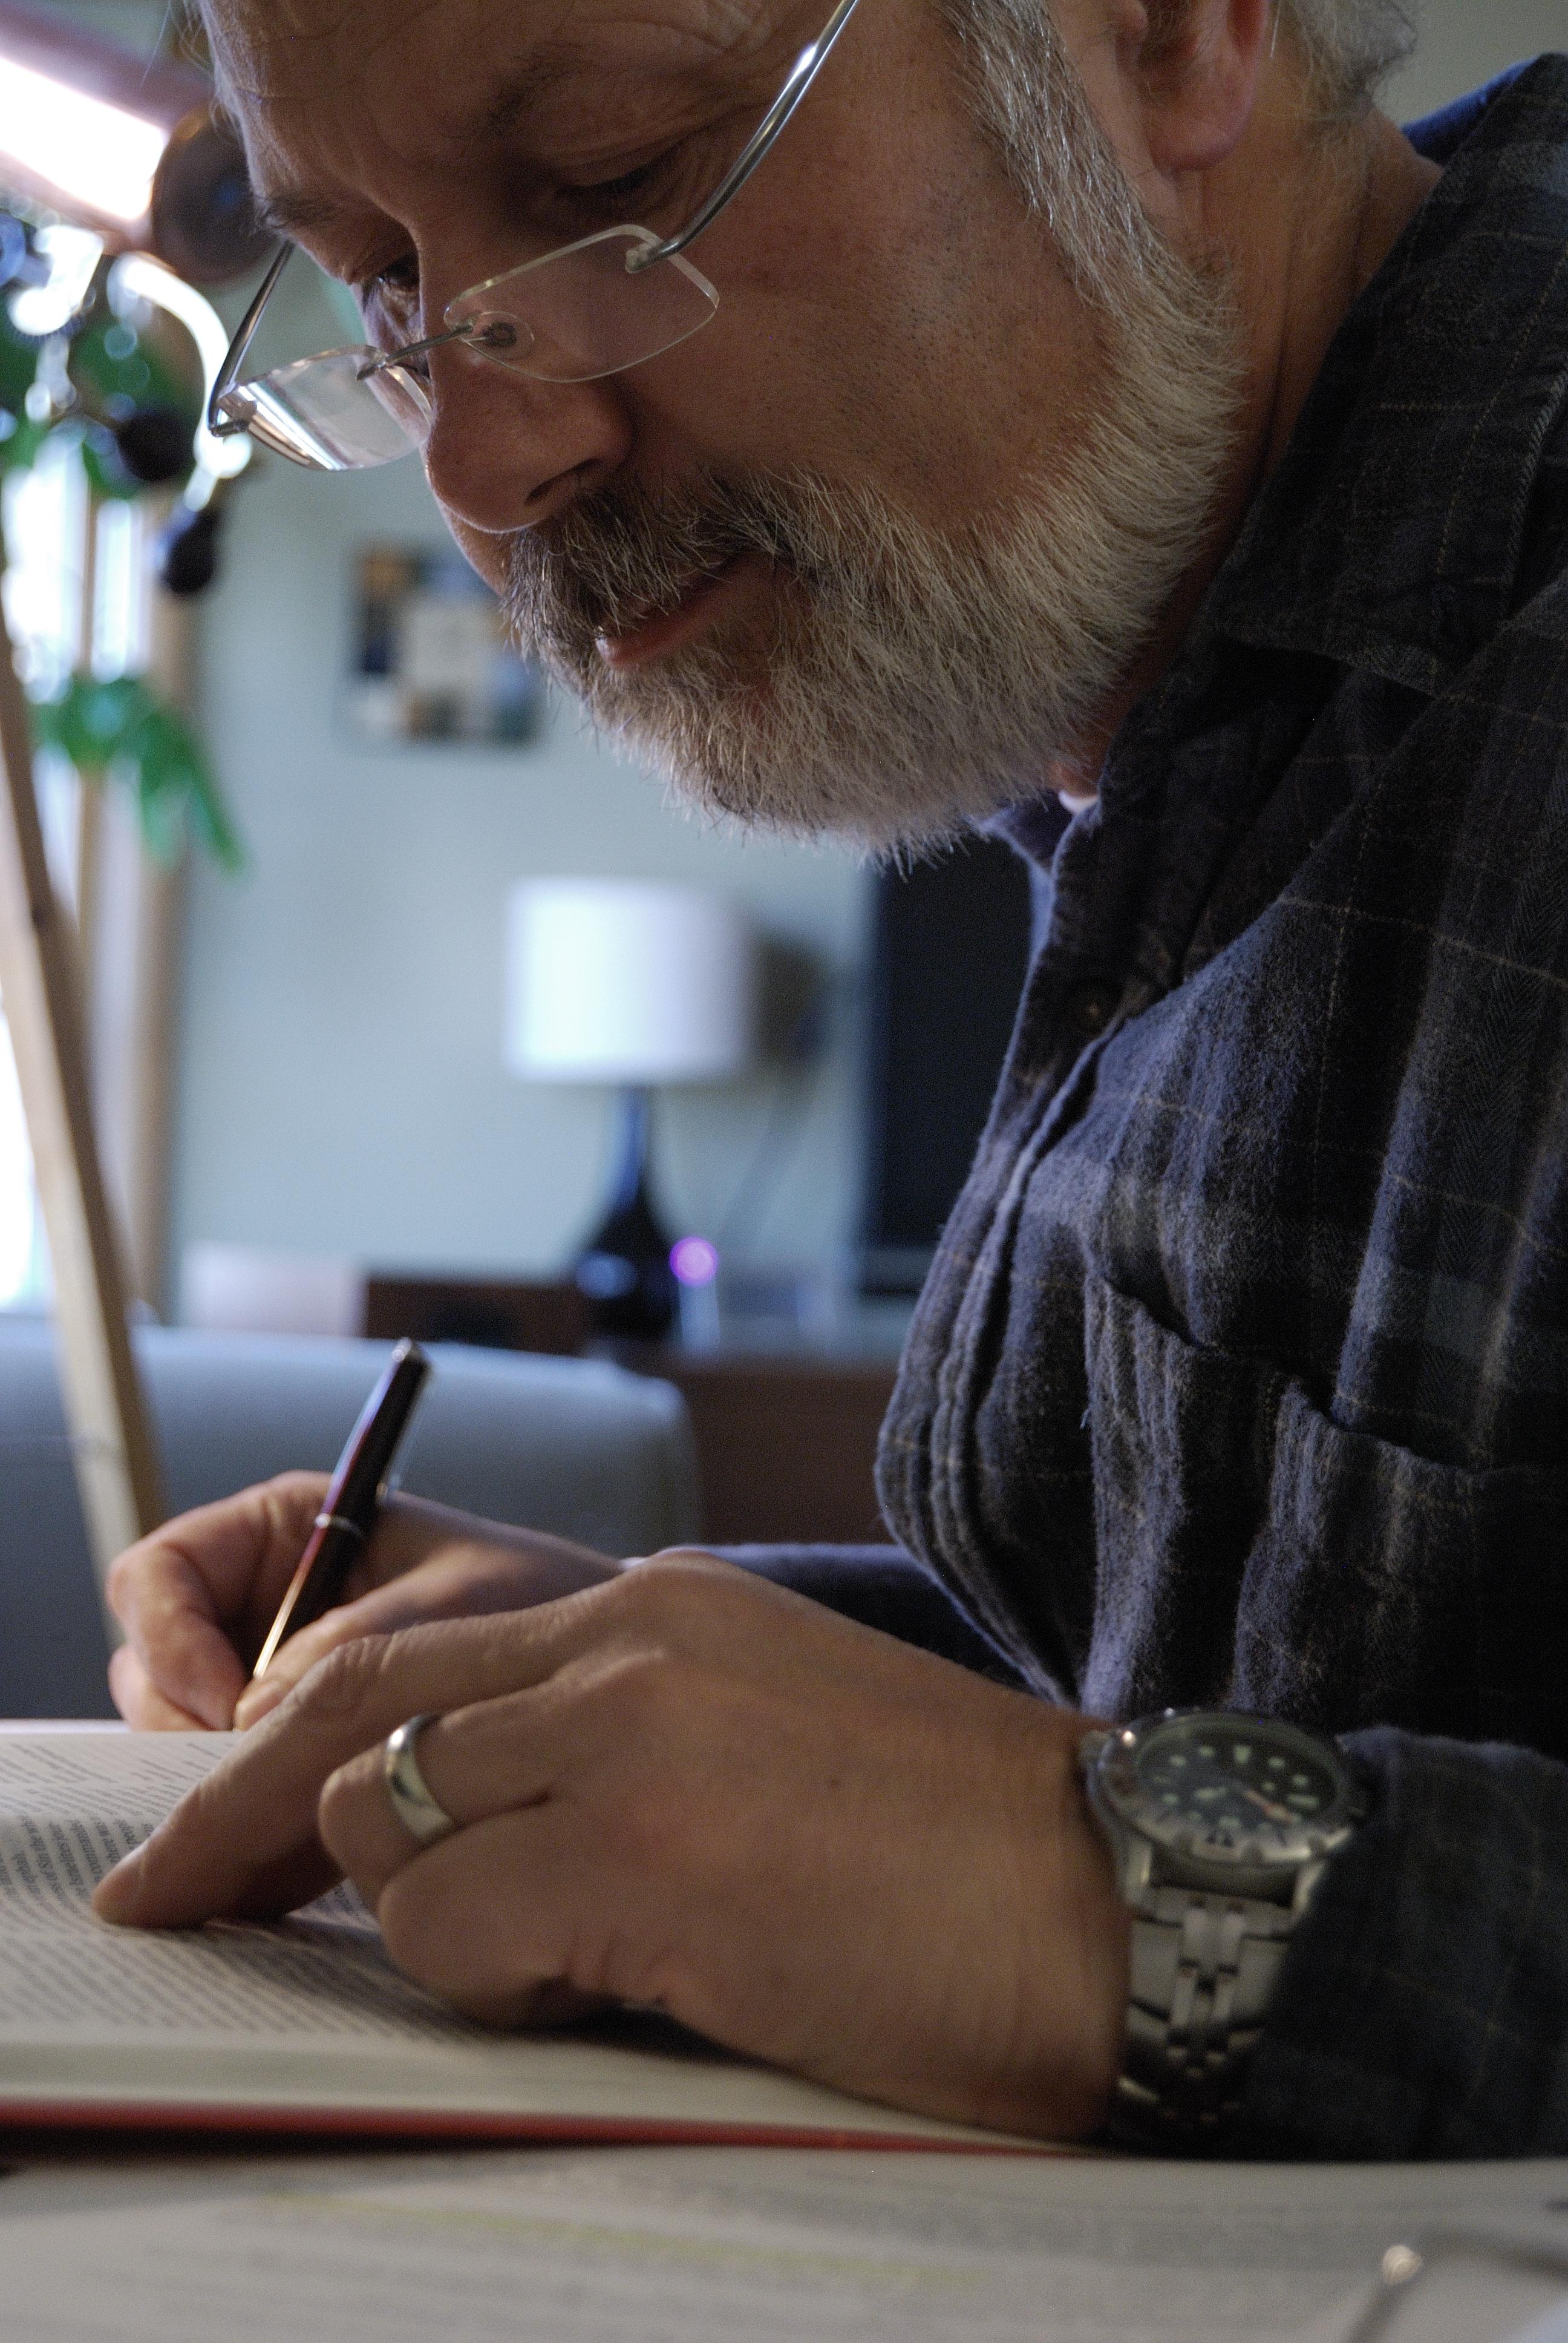 Coursework by Gary Allman